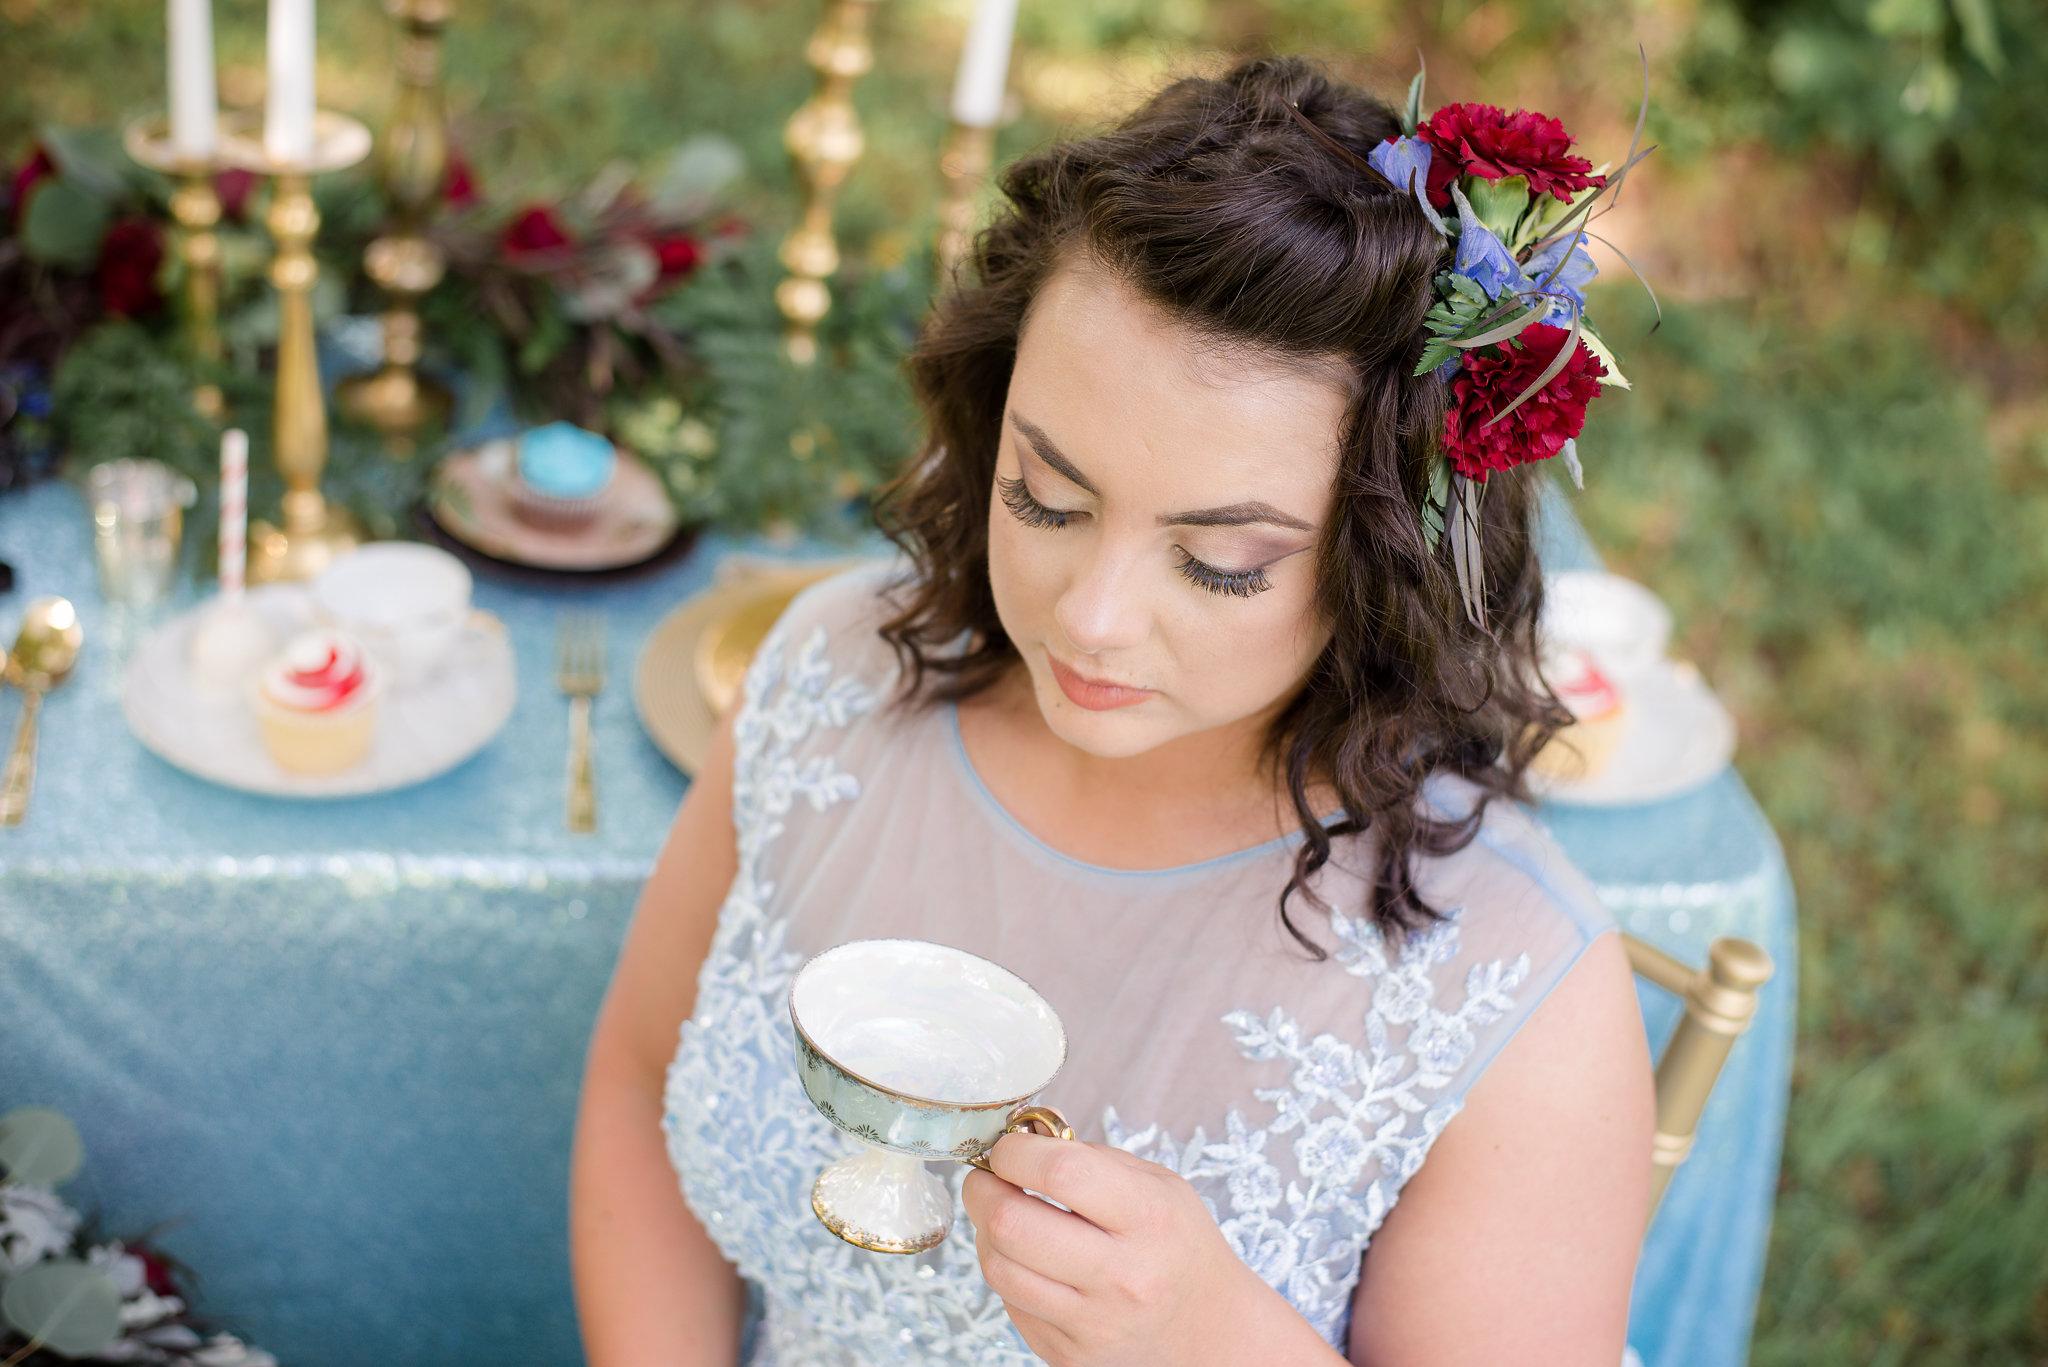 elizabeth-hayden-photography-wedding-arkansas-6126.jpg